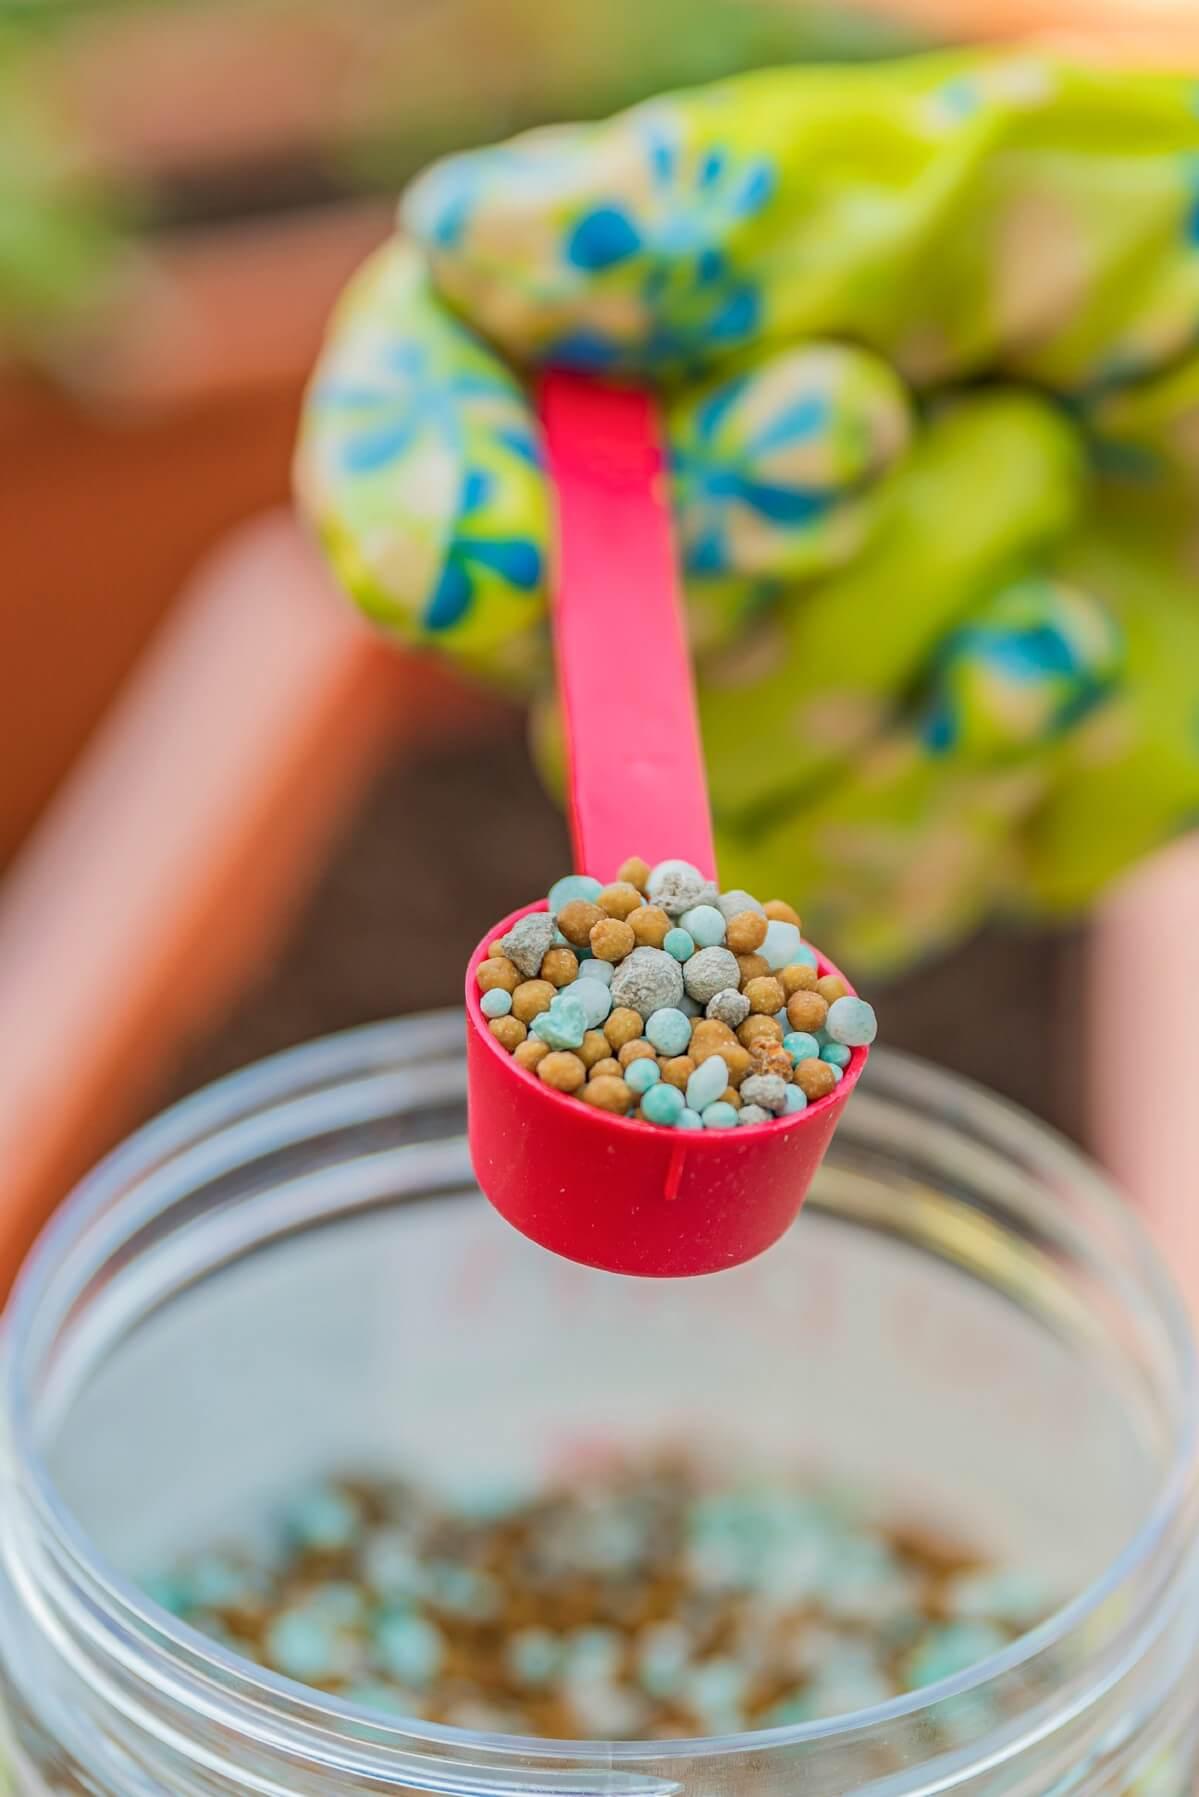 red scoop of plant fertilizer